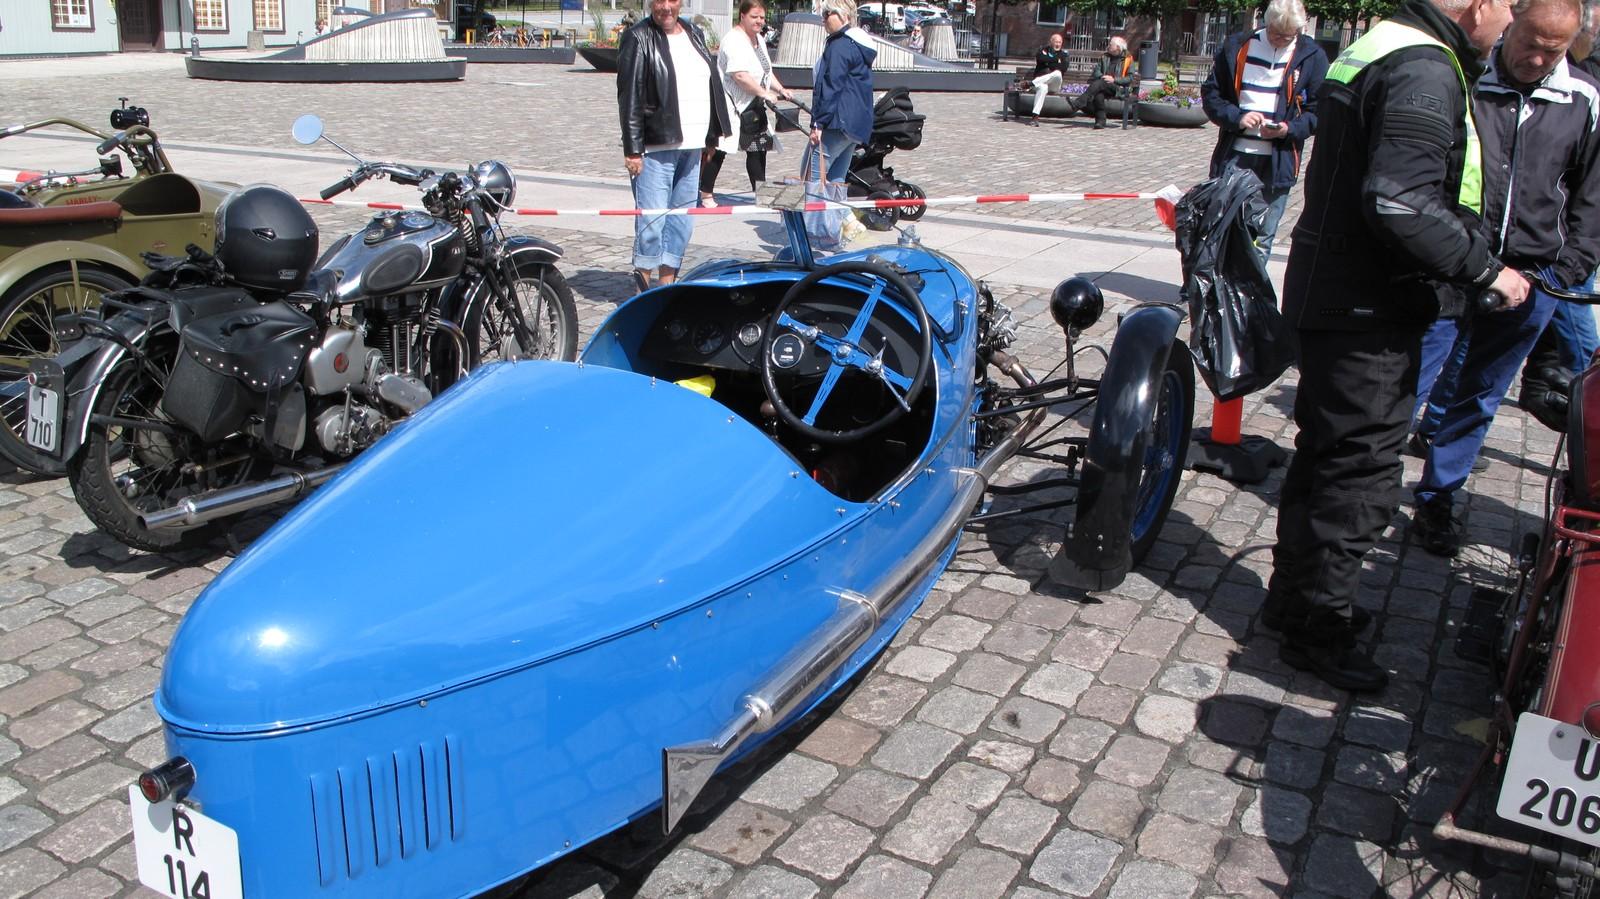 veteran motorsykkel2 veteran motorsykkel